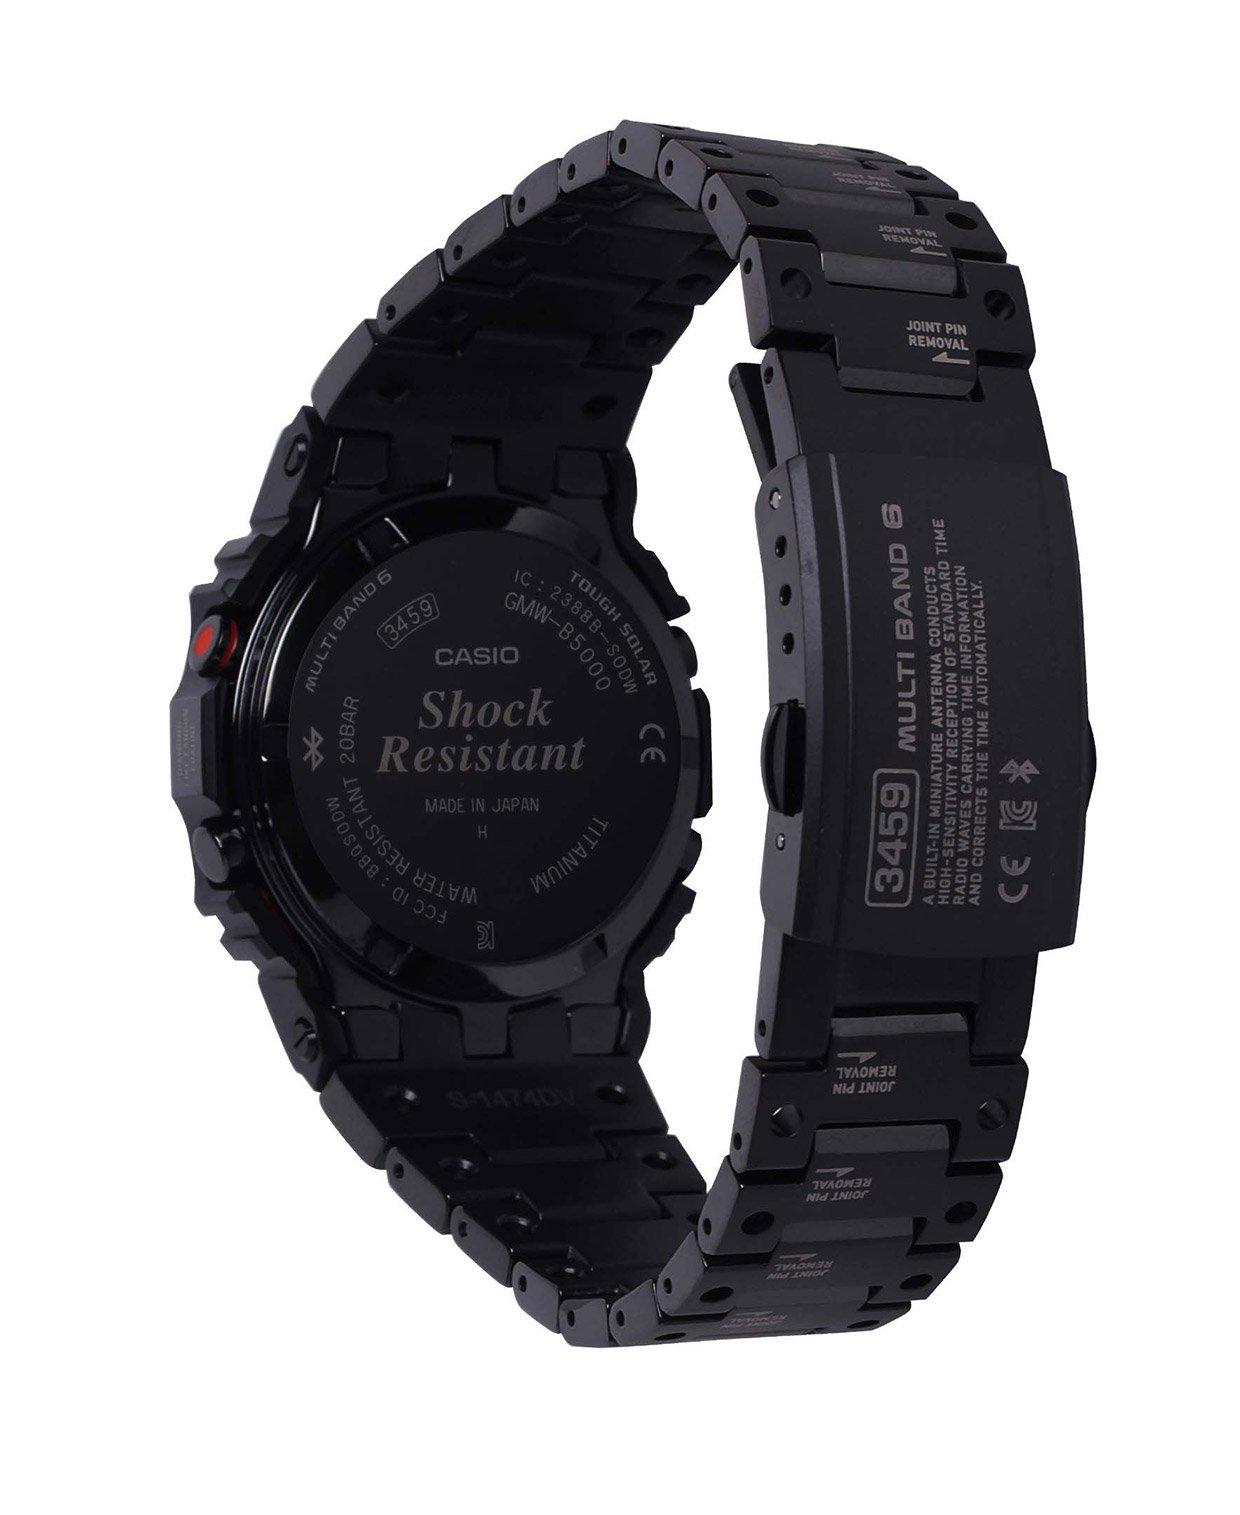 G-SHOCK GMW-B5000TVA-1 Watch